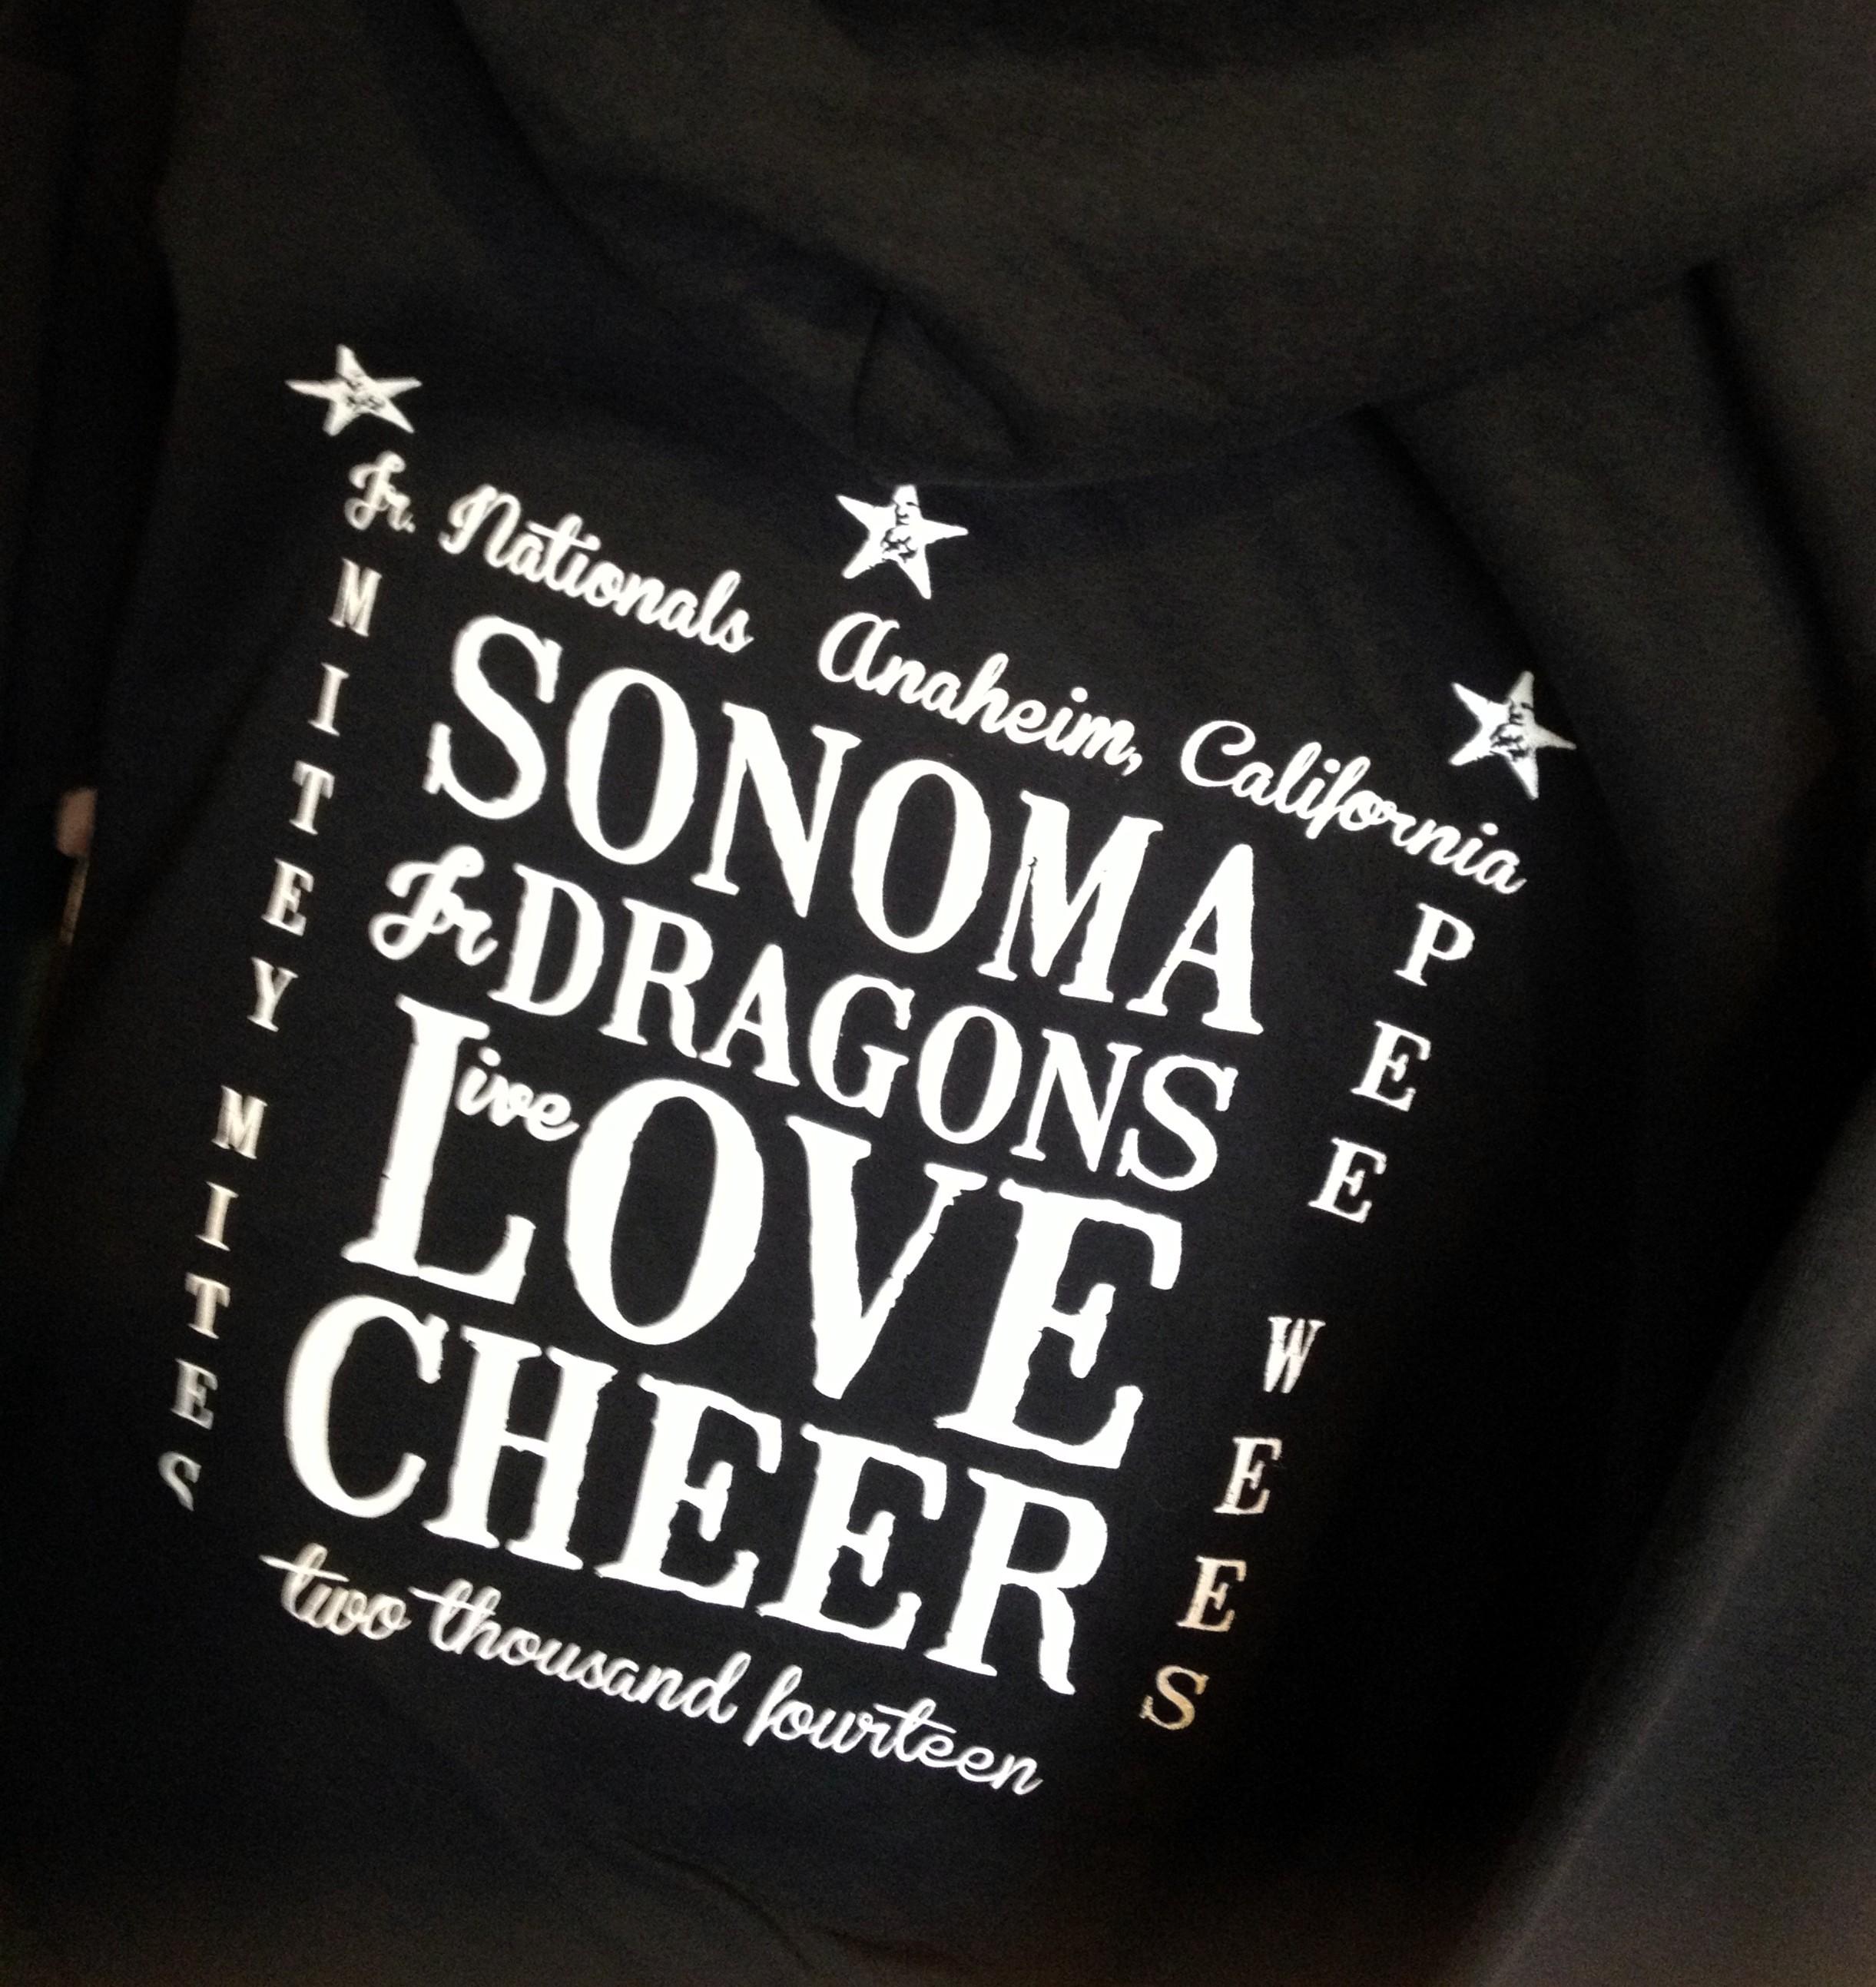 Sonoma Jr. Dragons Cheer